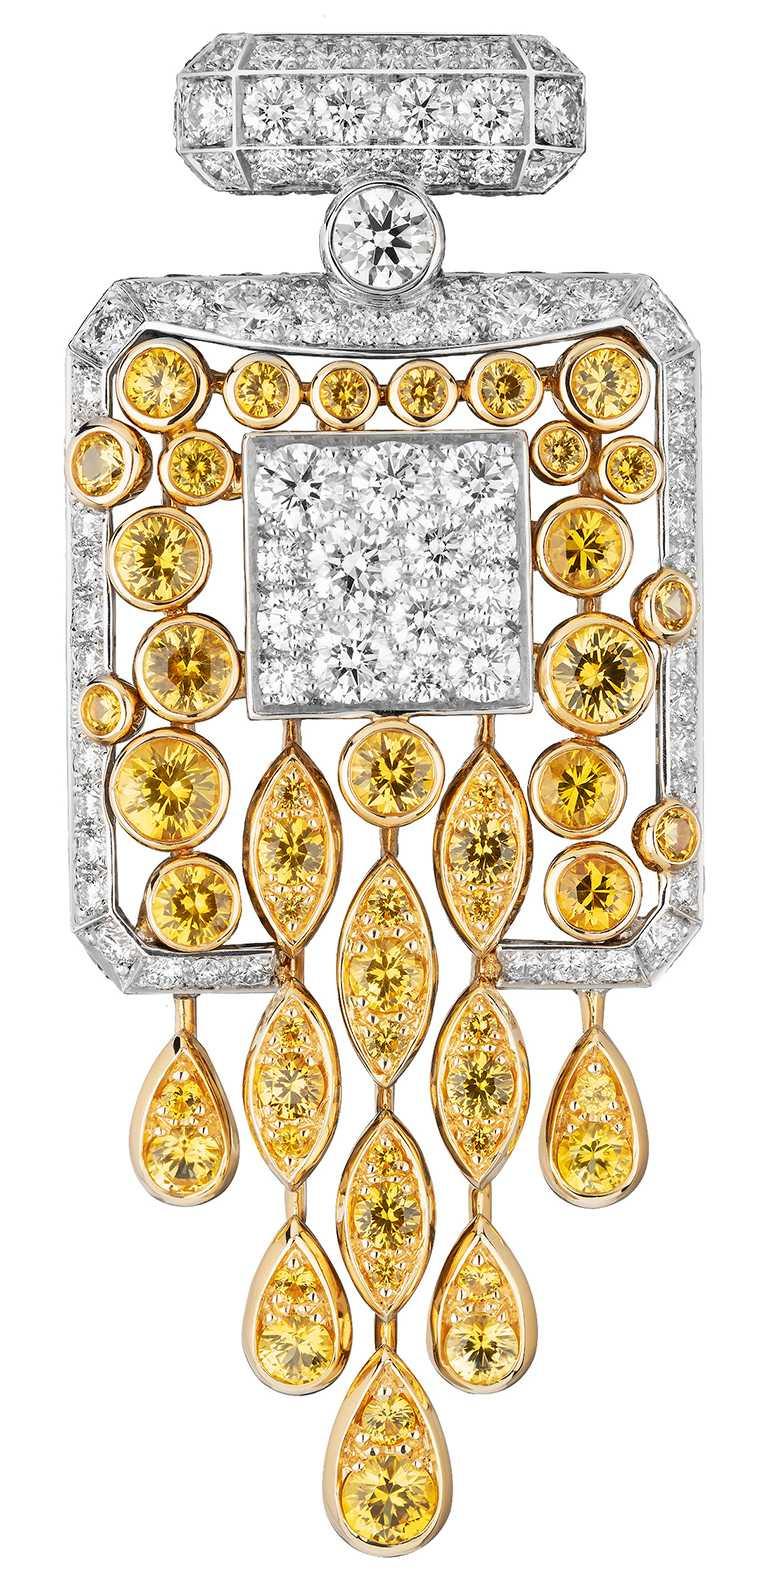 CHANEL「N°5」系列頂級珠寶,「N°5 Signature Bottle」胸針,18K黃金及白金鑲嵌黃色藍寶石及鑽石╱2,310,000元。(圖╱CHANEL提供)